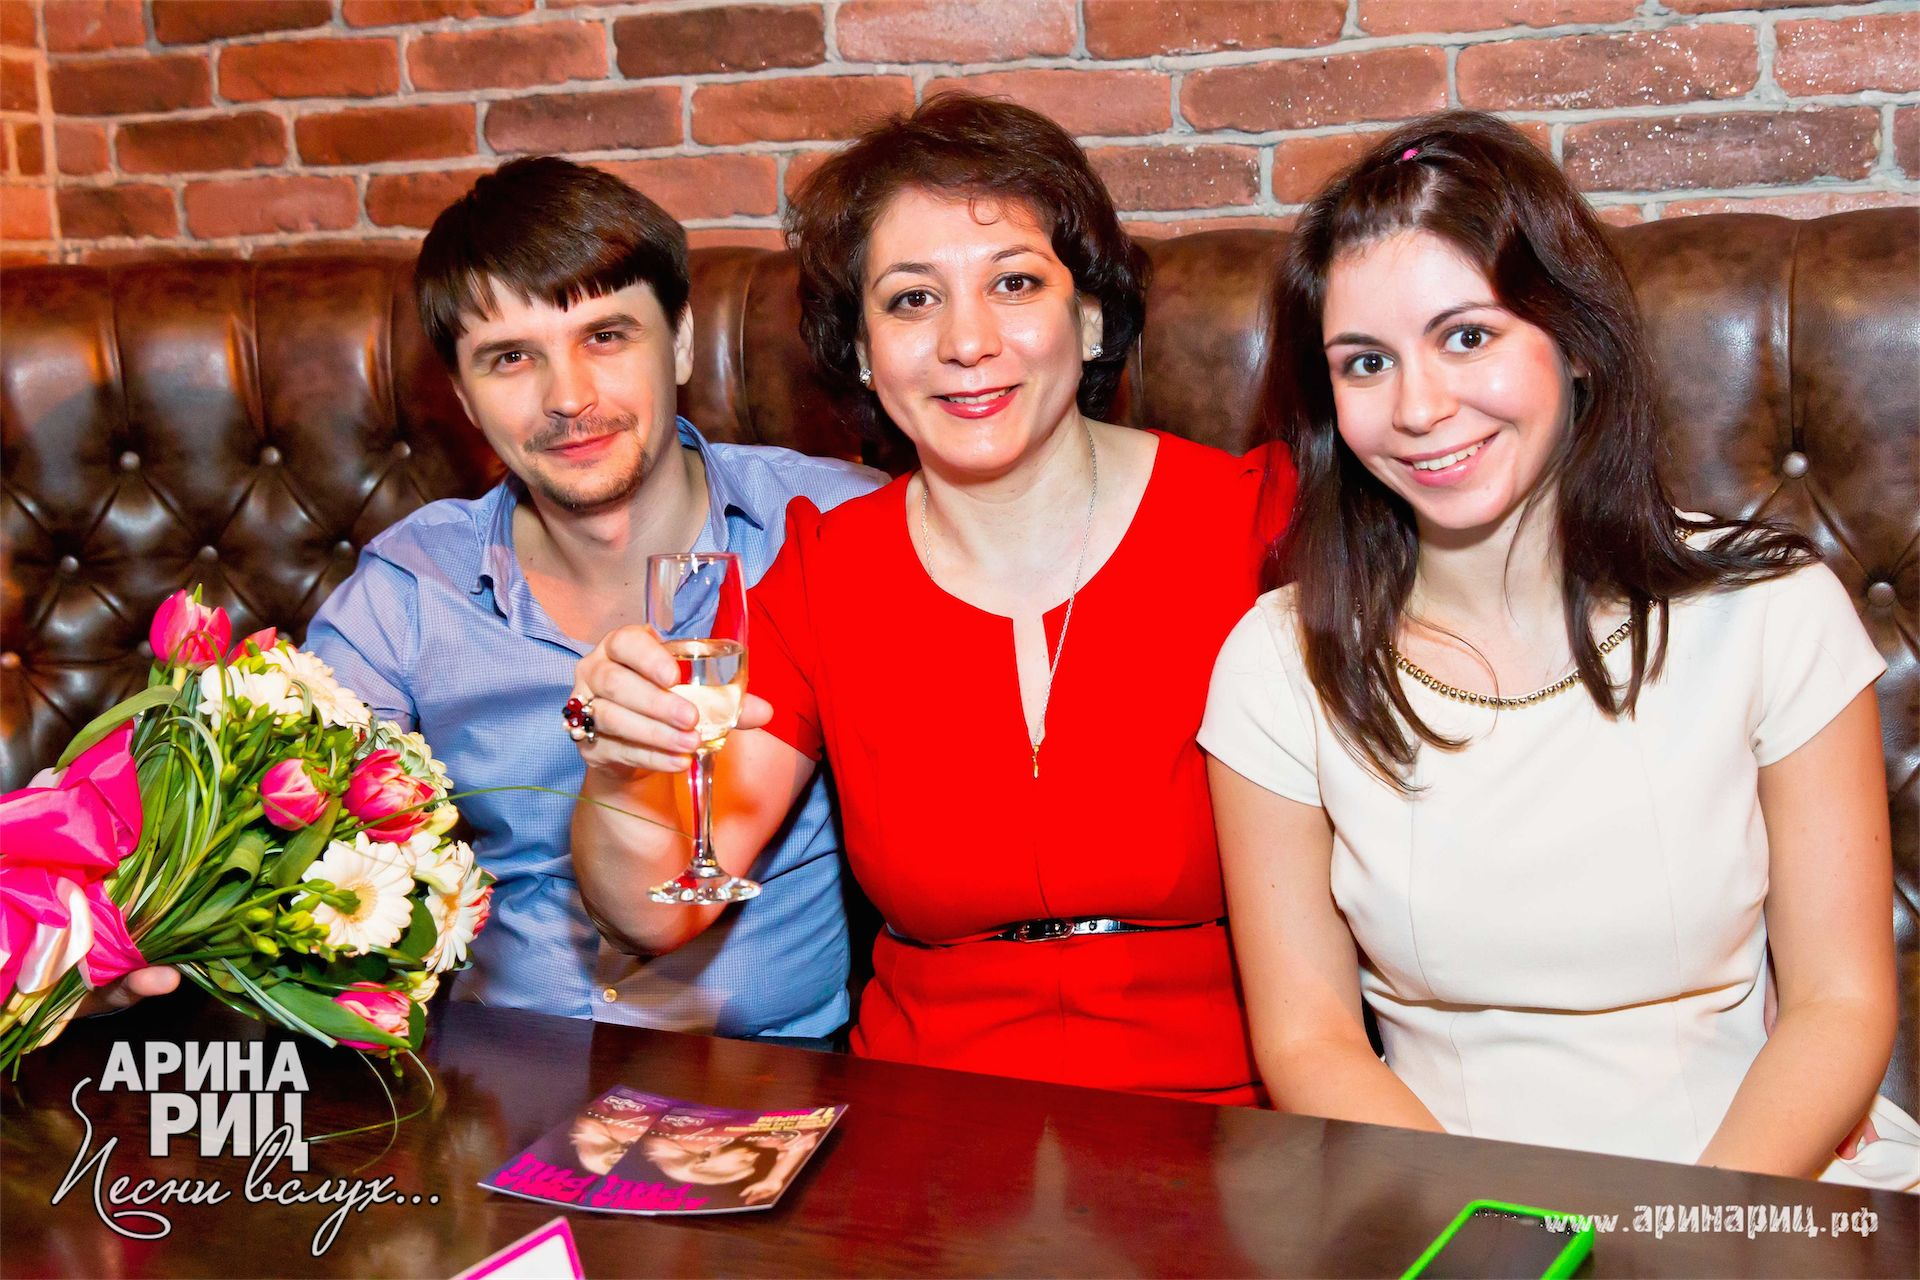 ArinaRitz_Guests013.jpg